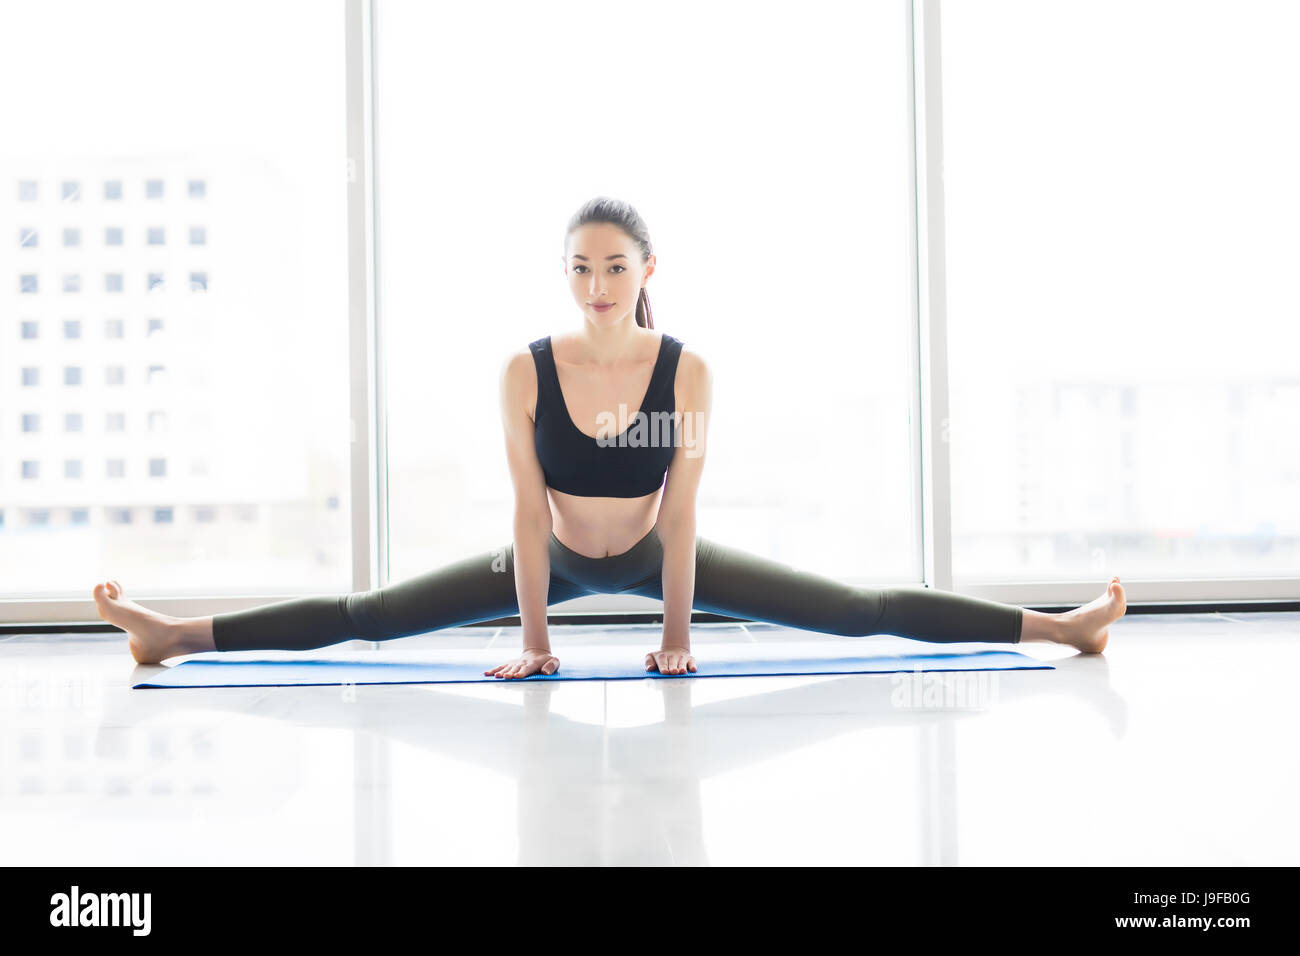 Sportbekleidung Praktizieren Übung Tragen Junge Yoga In Yoga Frau 7RXZzvq